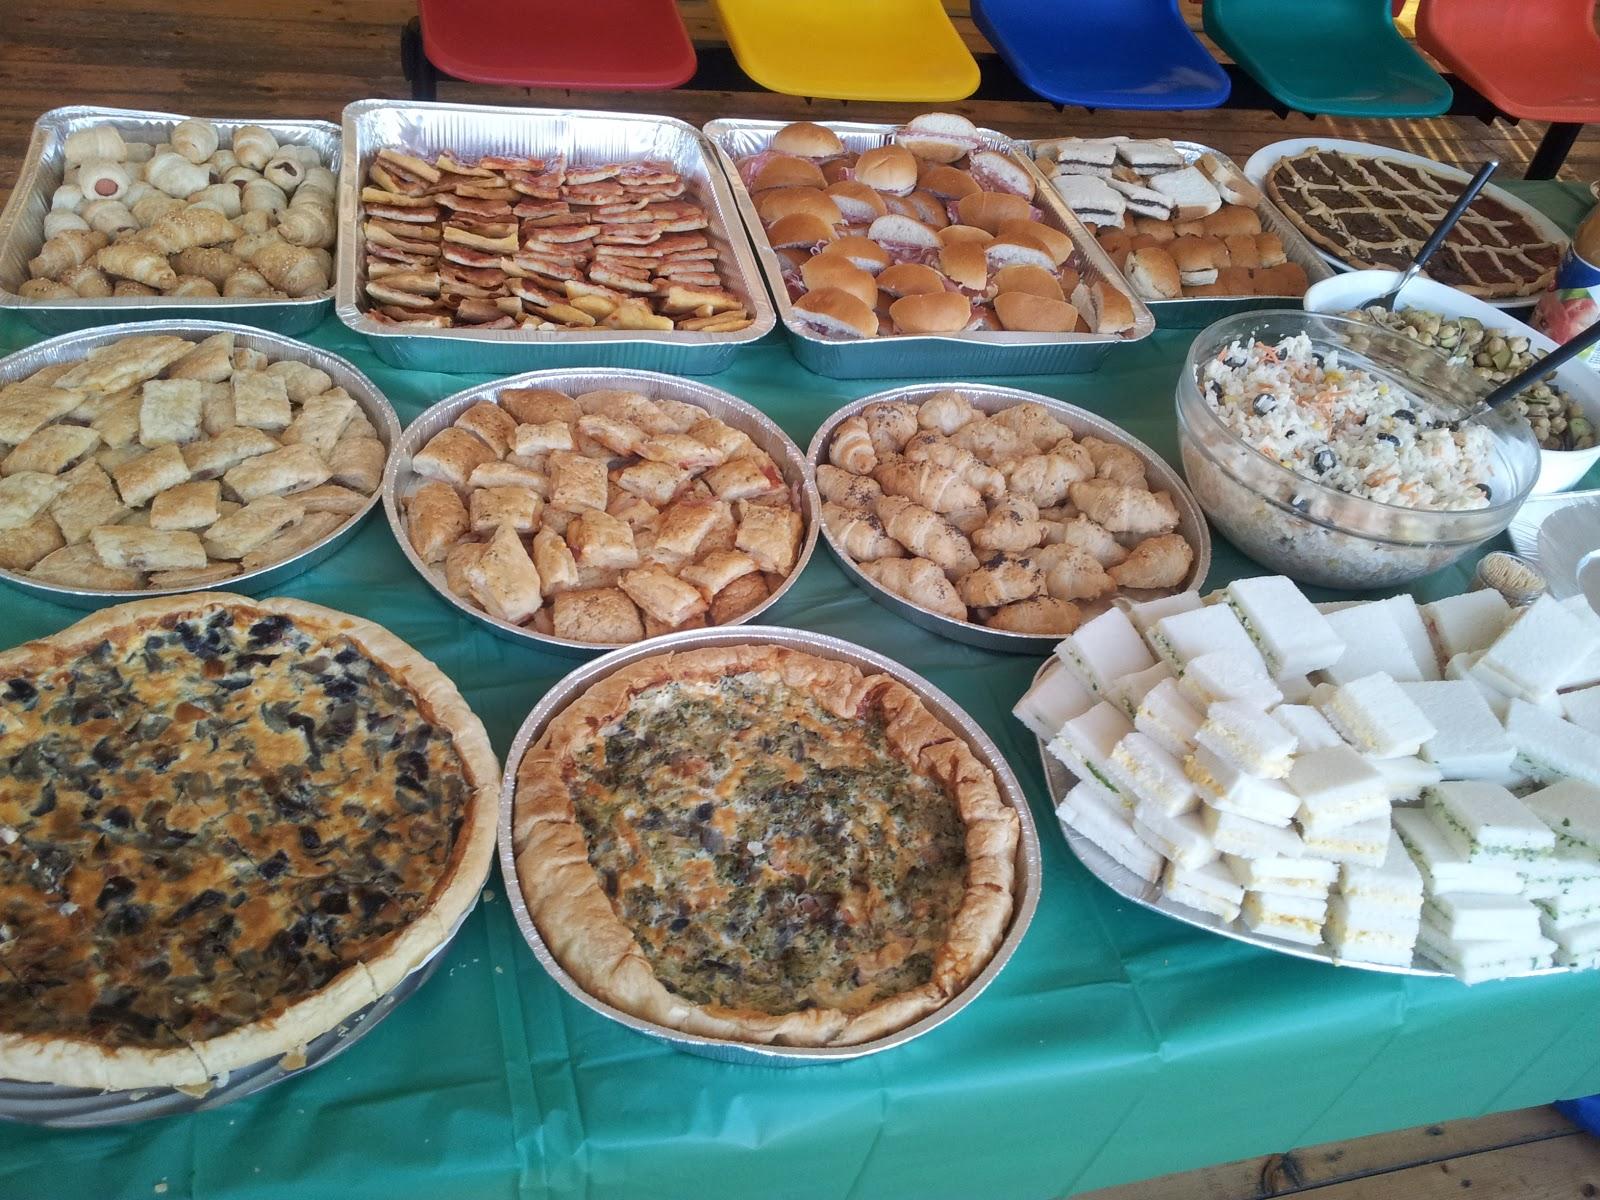 Famoso Buffet compleanno Asia | Cucino ma sarei a dieta!!! LL21